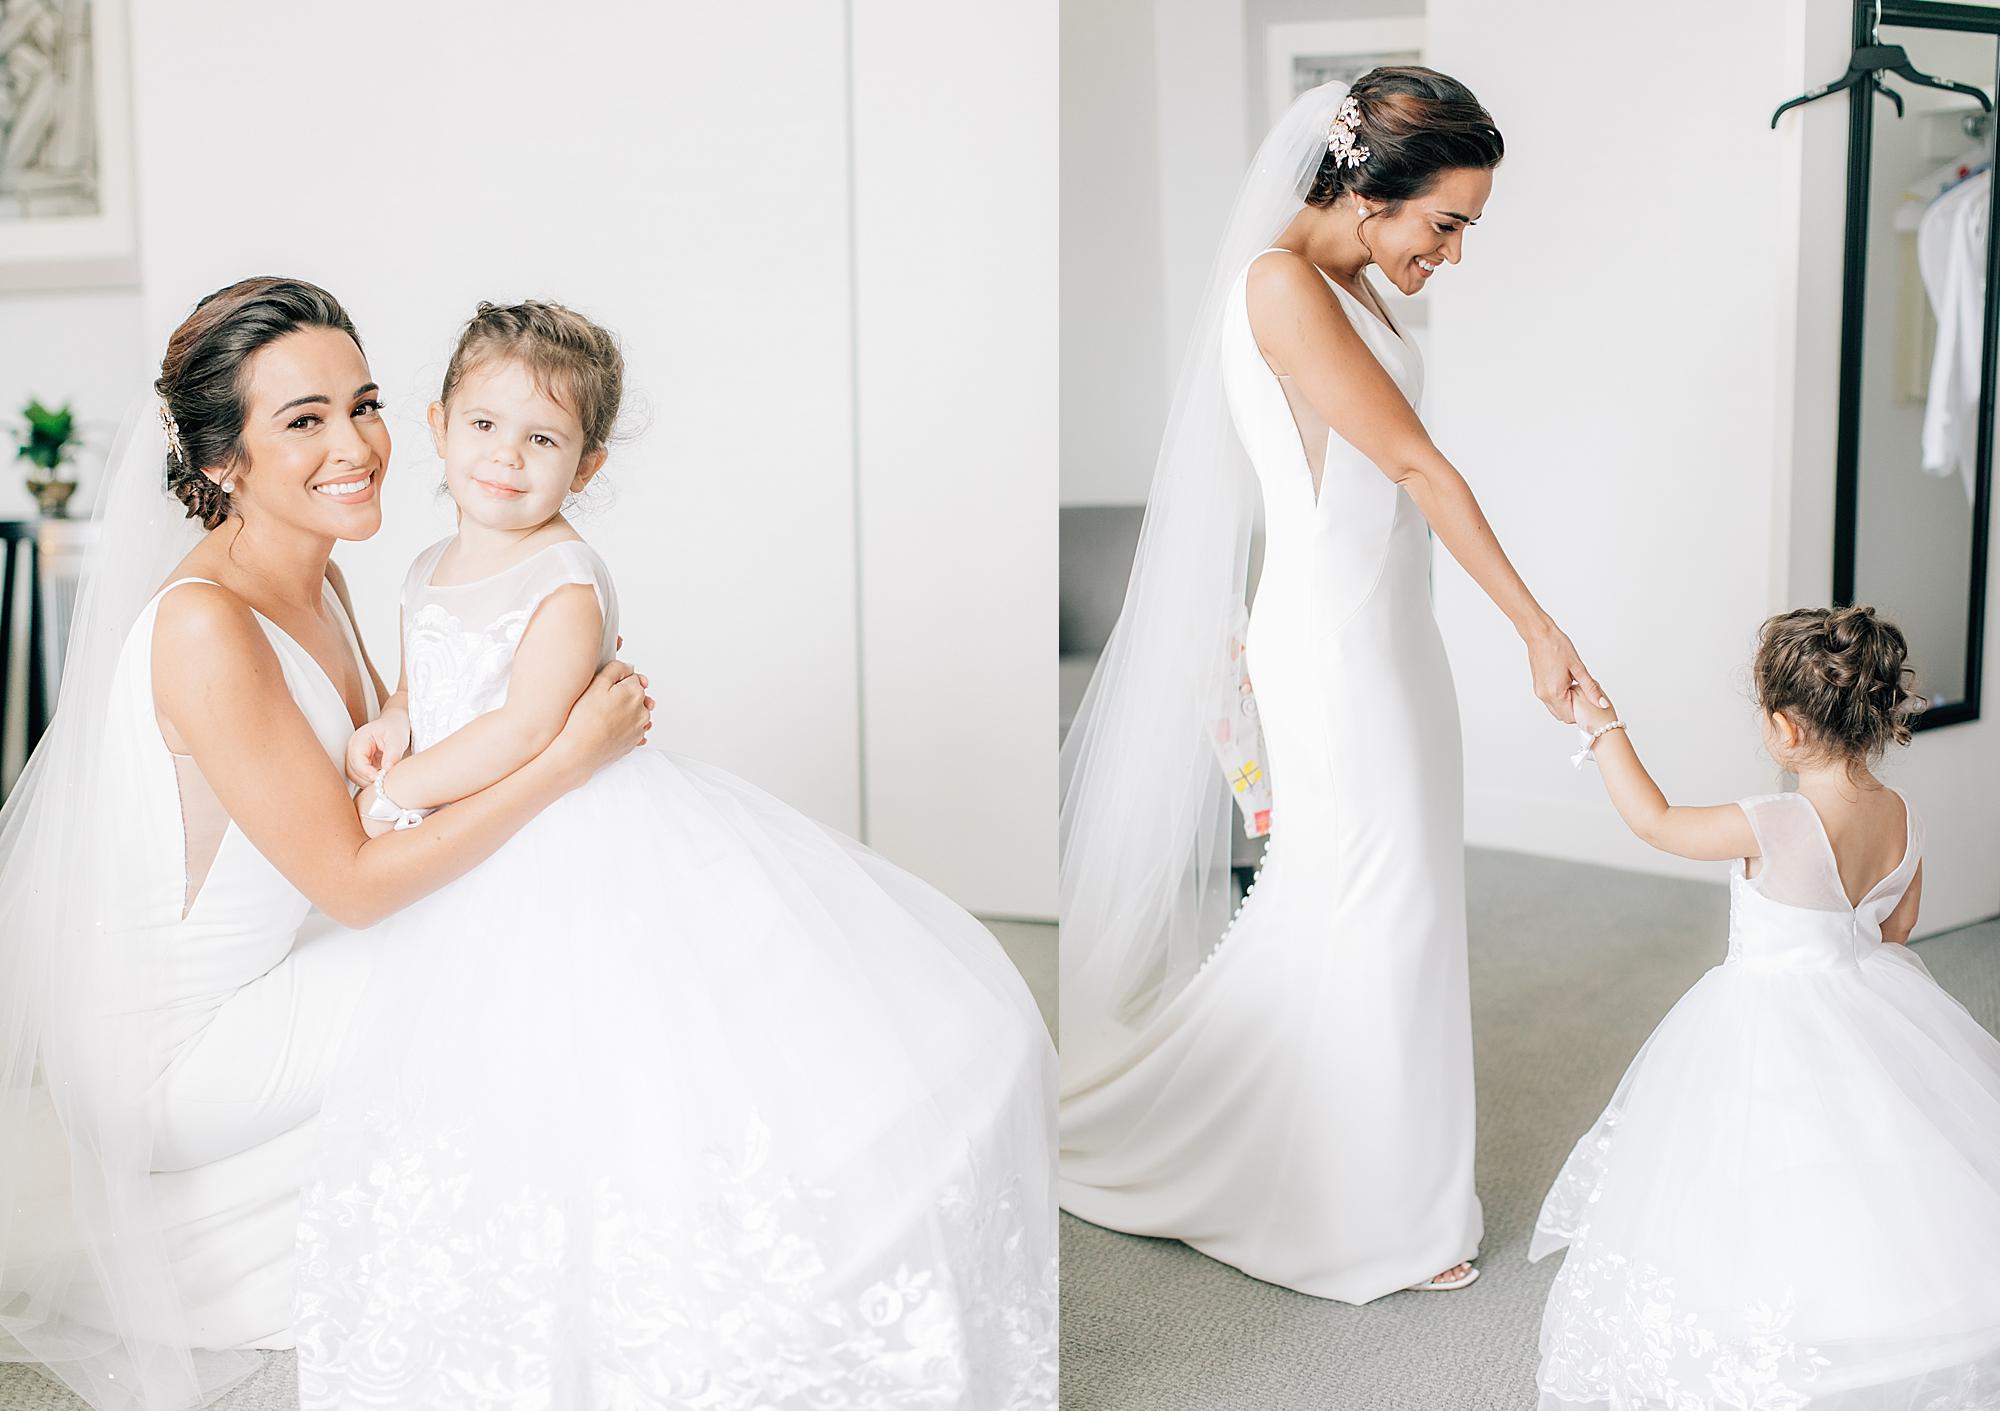 Cescaphe Philadelphia Film Wedding Photography by Magdalena Studios 11